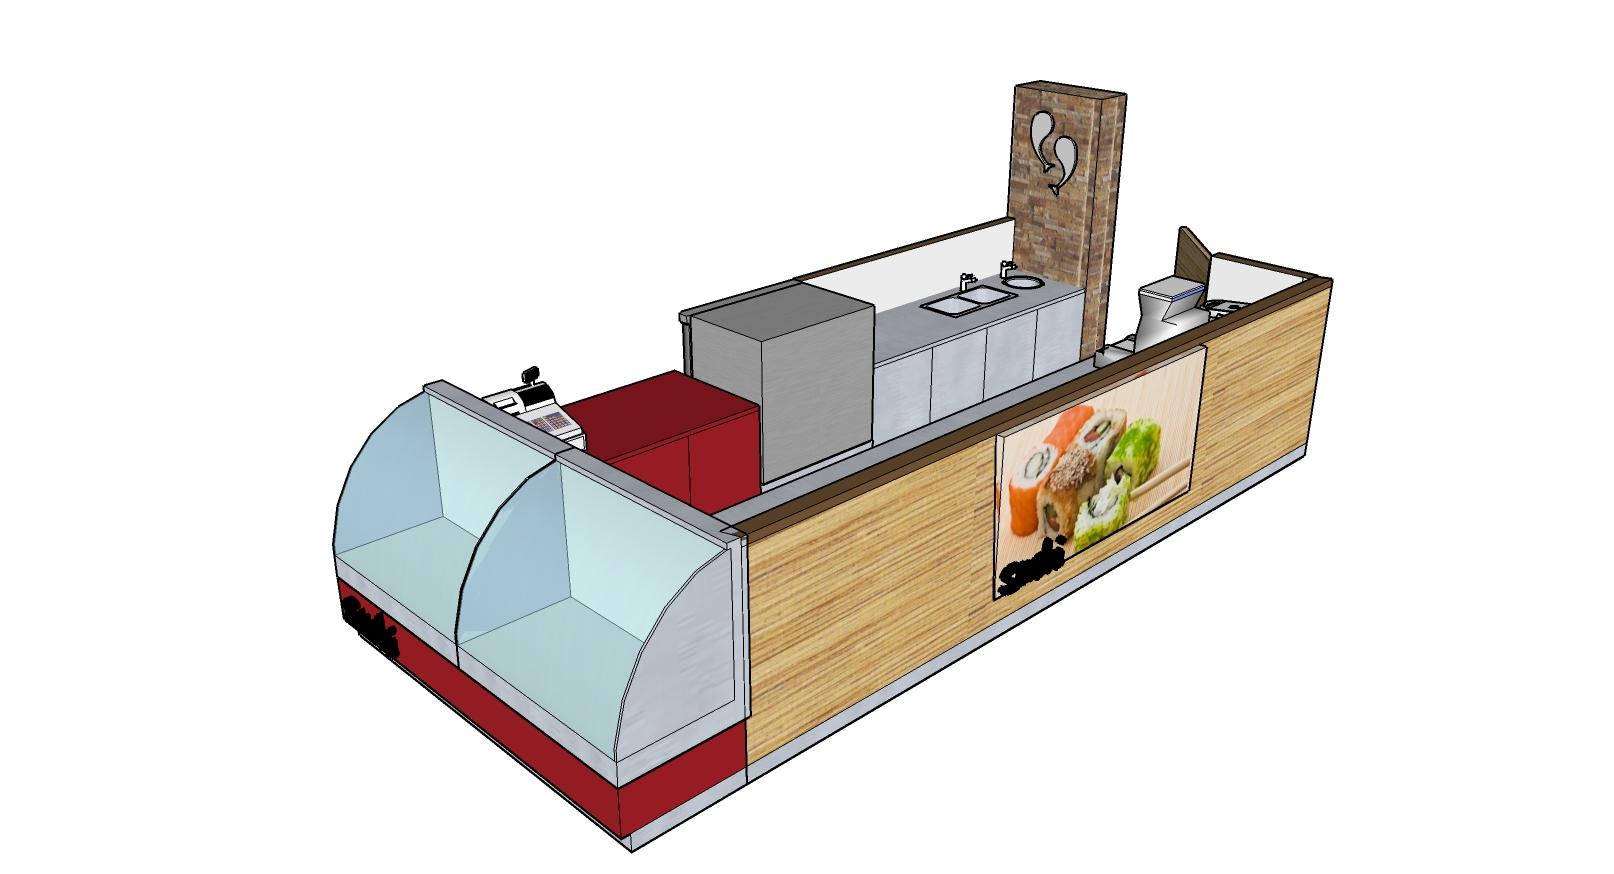 Sushi Kiosk Darwin 3D Mdel Design by Hodgkison Darwin Architects